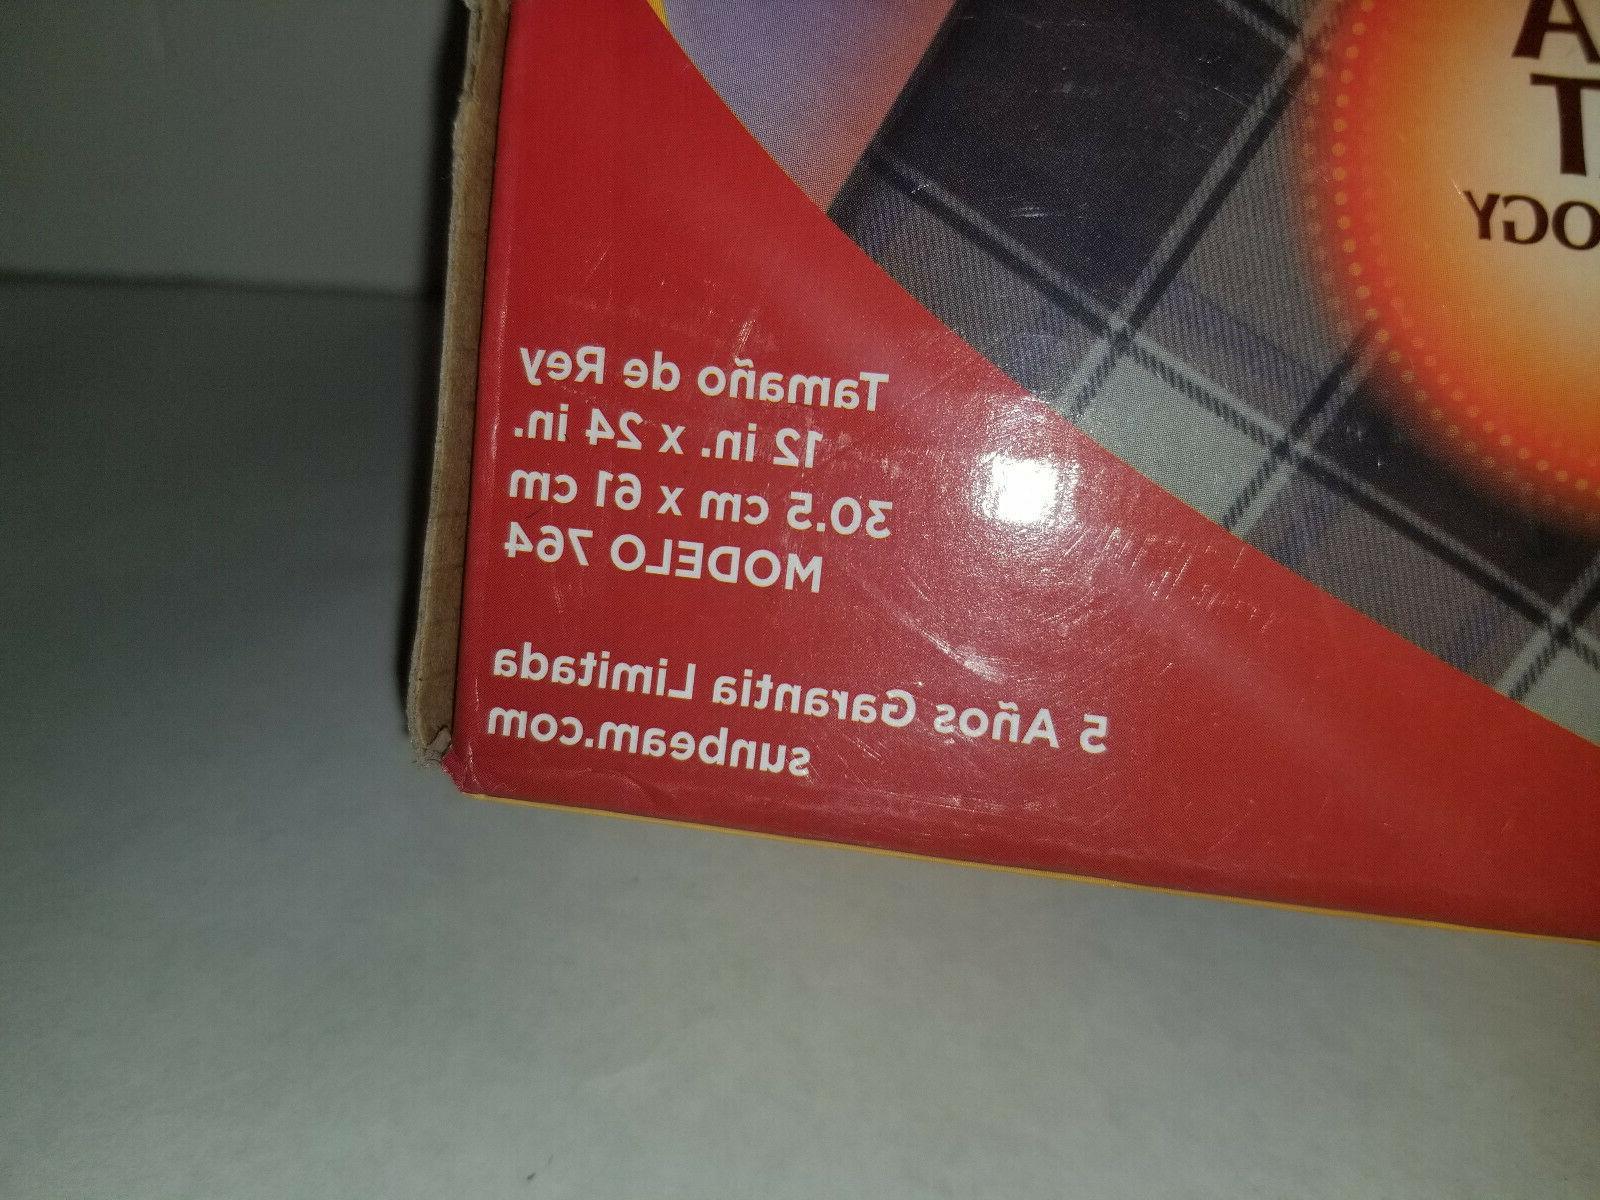 NEW Sunbeam Moist/Dry Heating UltraHeat Technologymodel 764